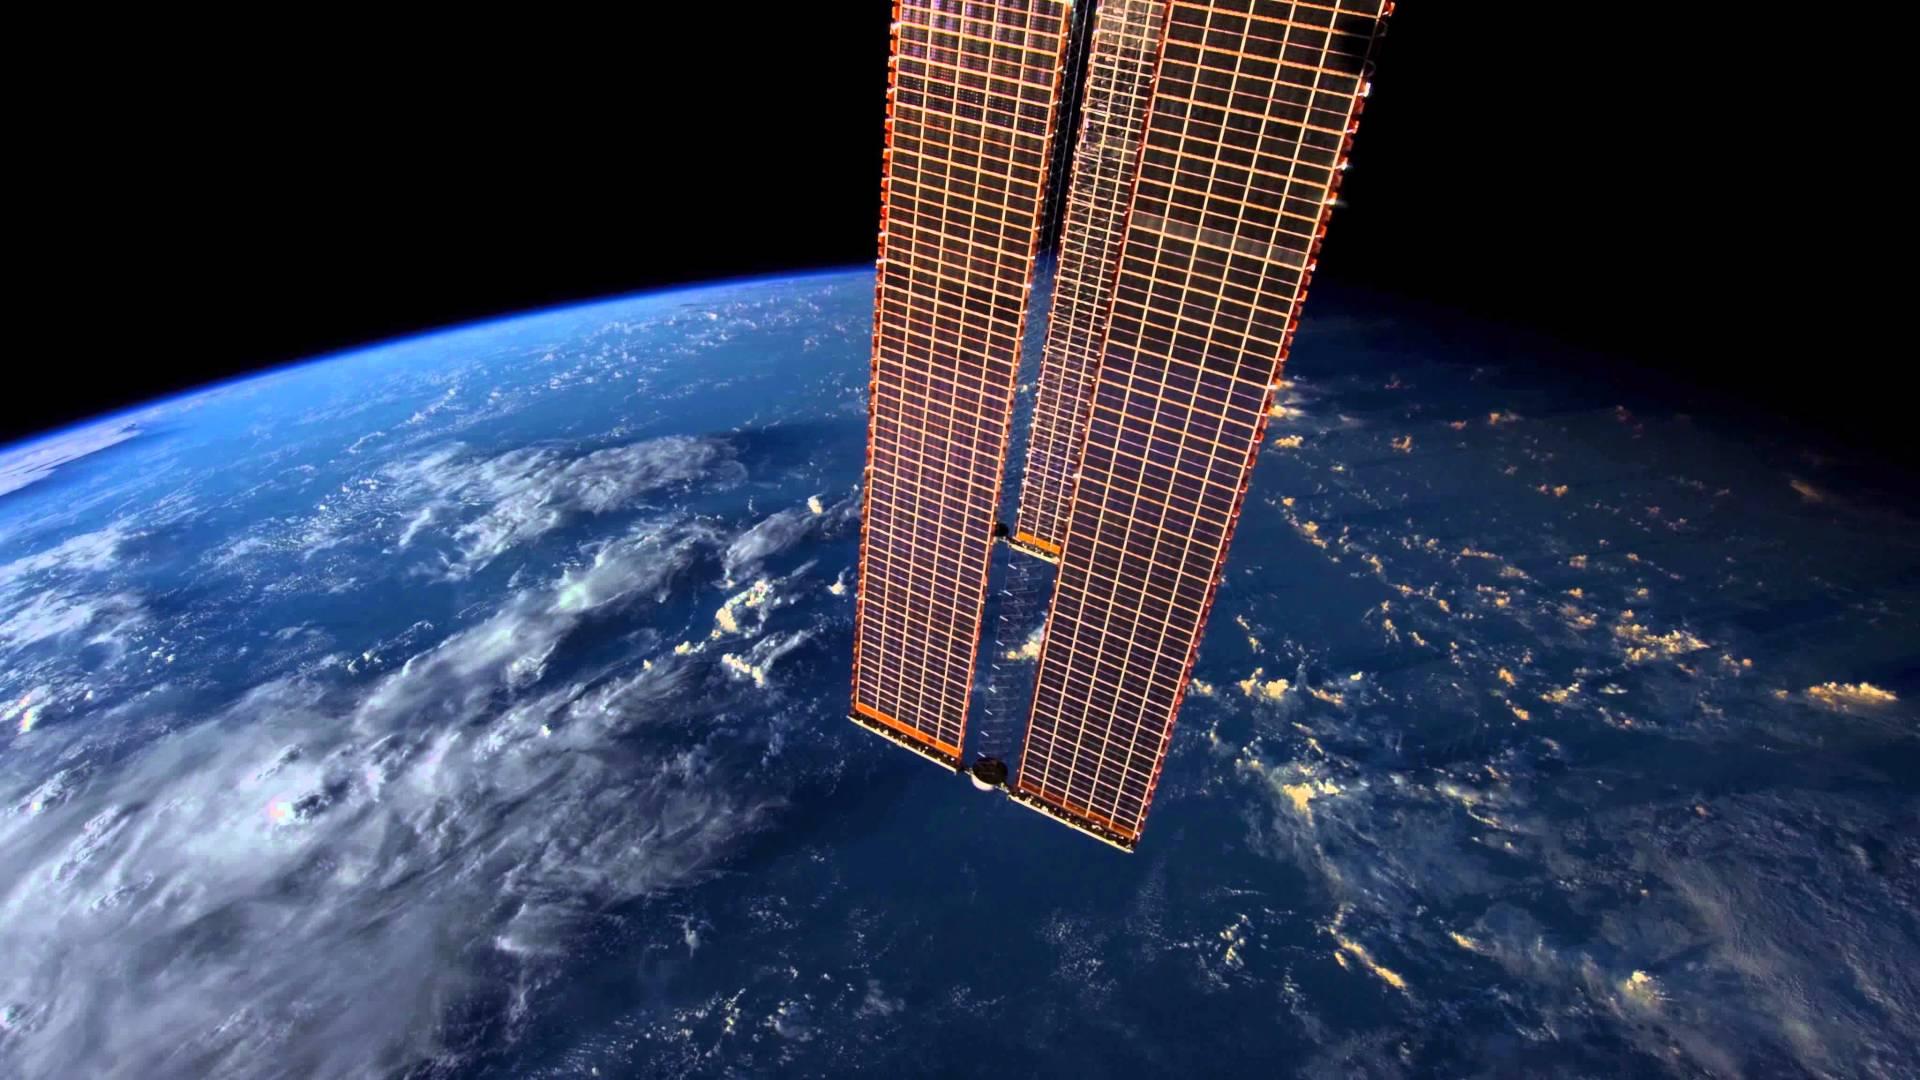 NASA Começa a Divulgar Vídeos 4K Ultra HD com Imagens Deslumbrantes da Terra